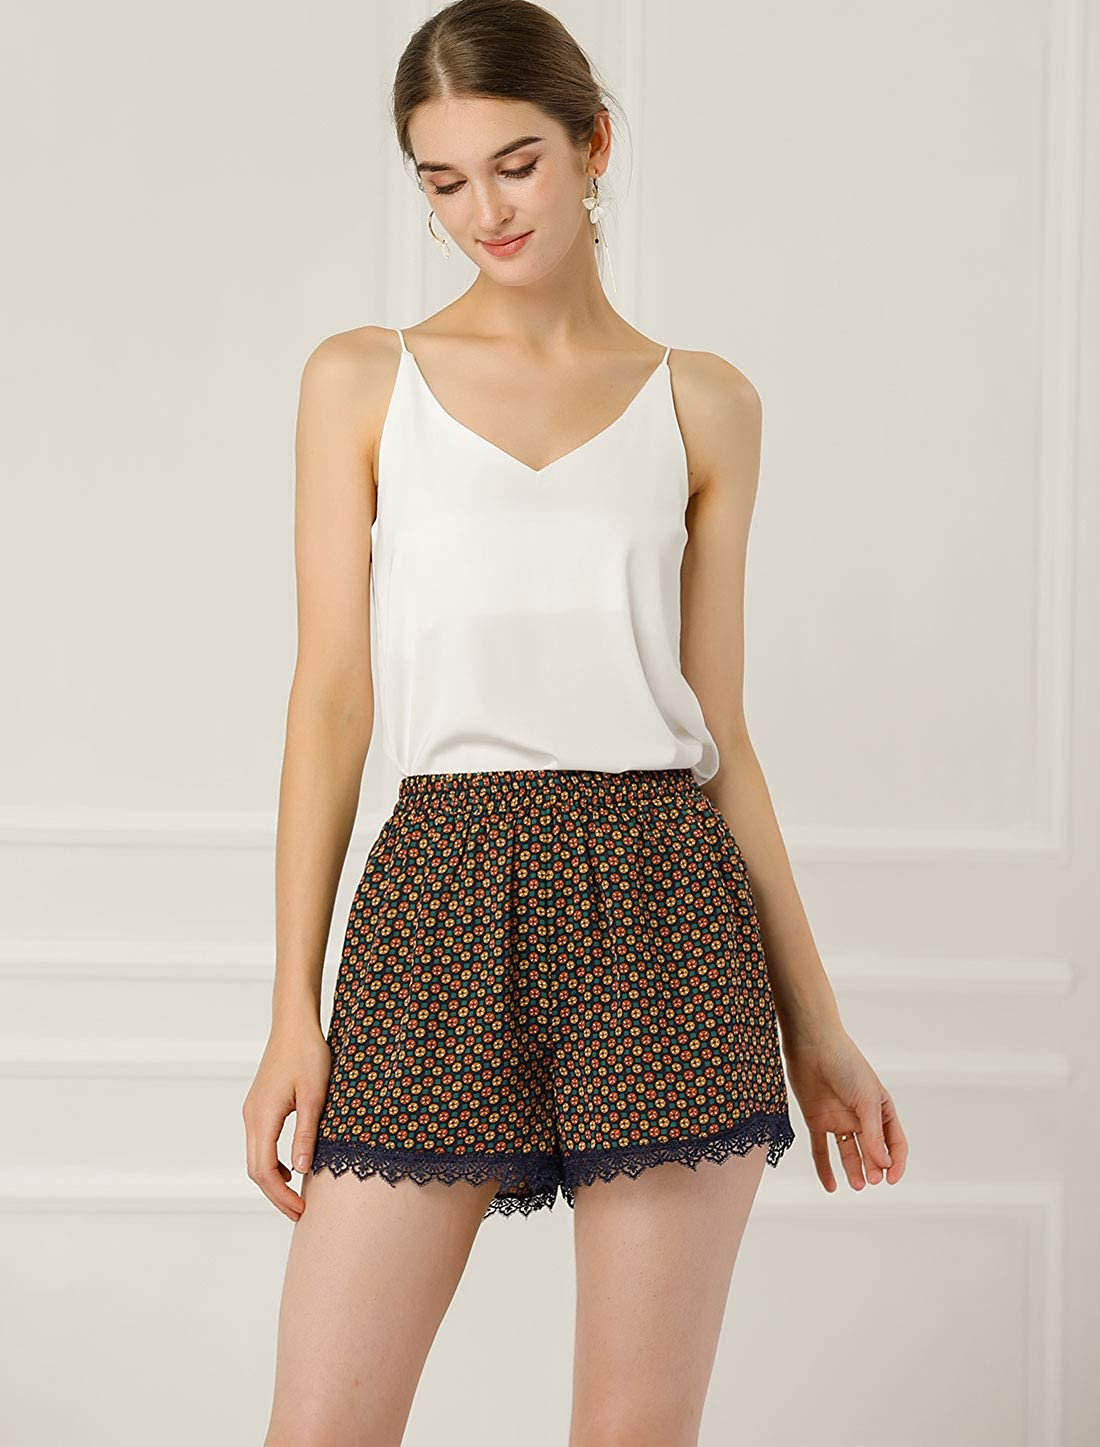 Allegra K Womens Summer Floral Printed Lace Trim Elastic Waist Beach Shorts